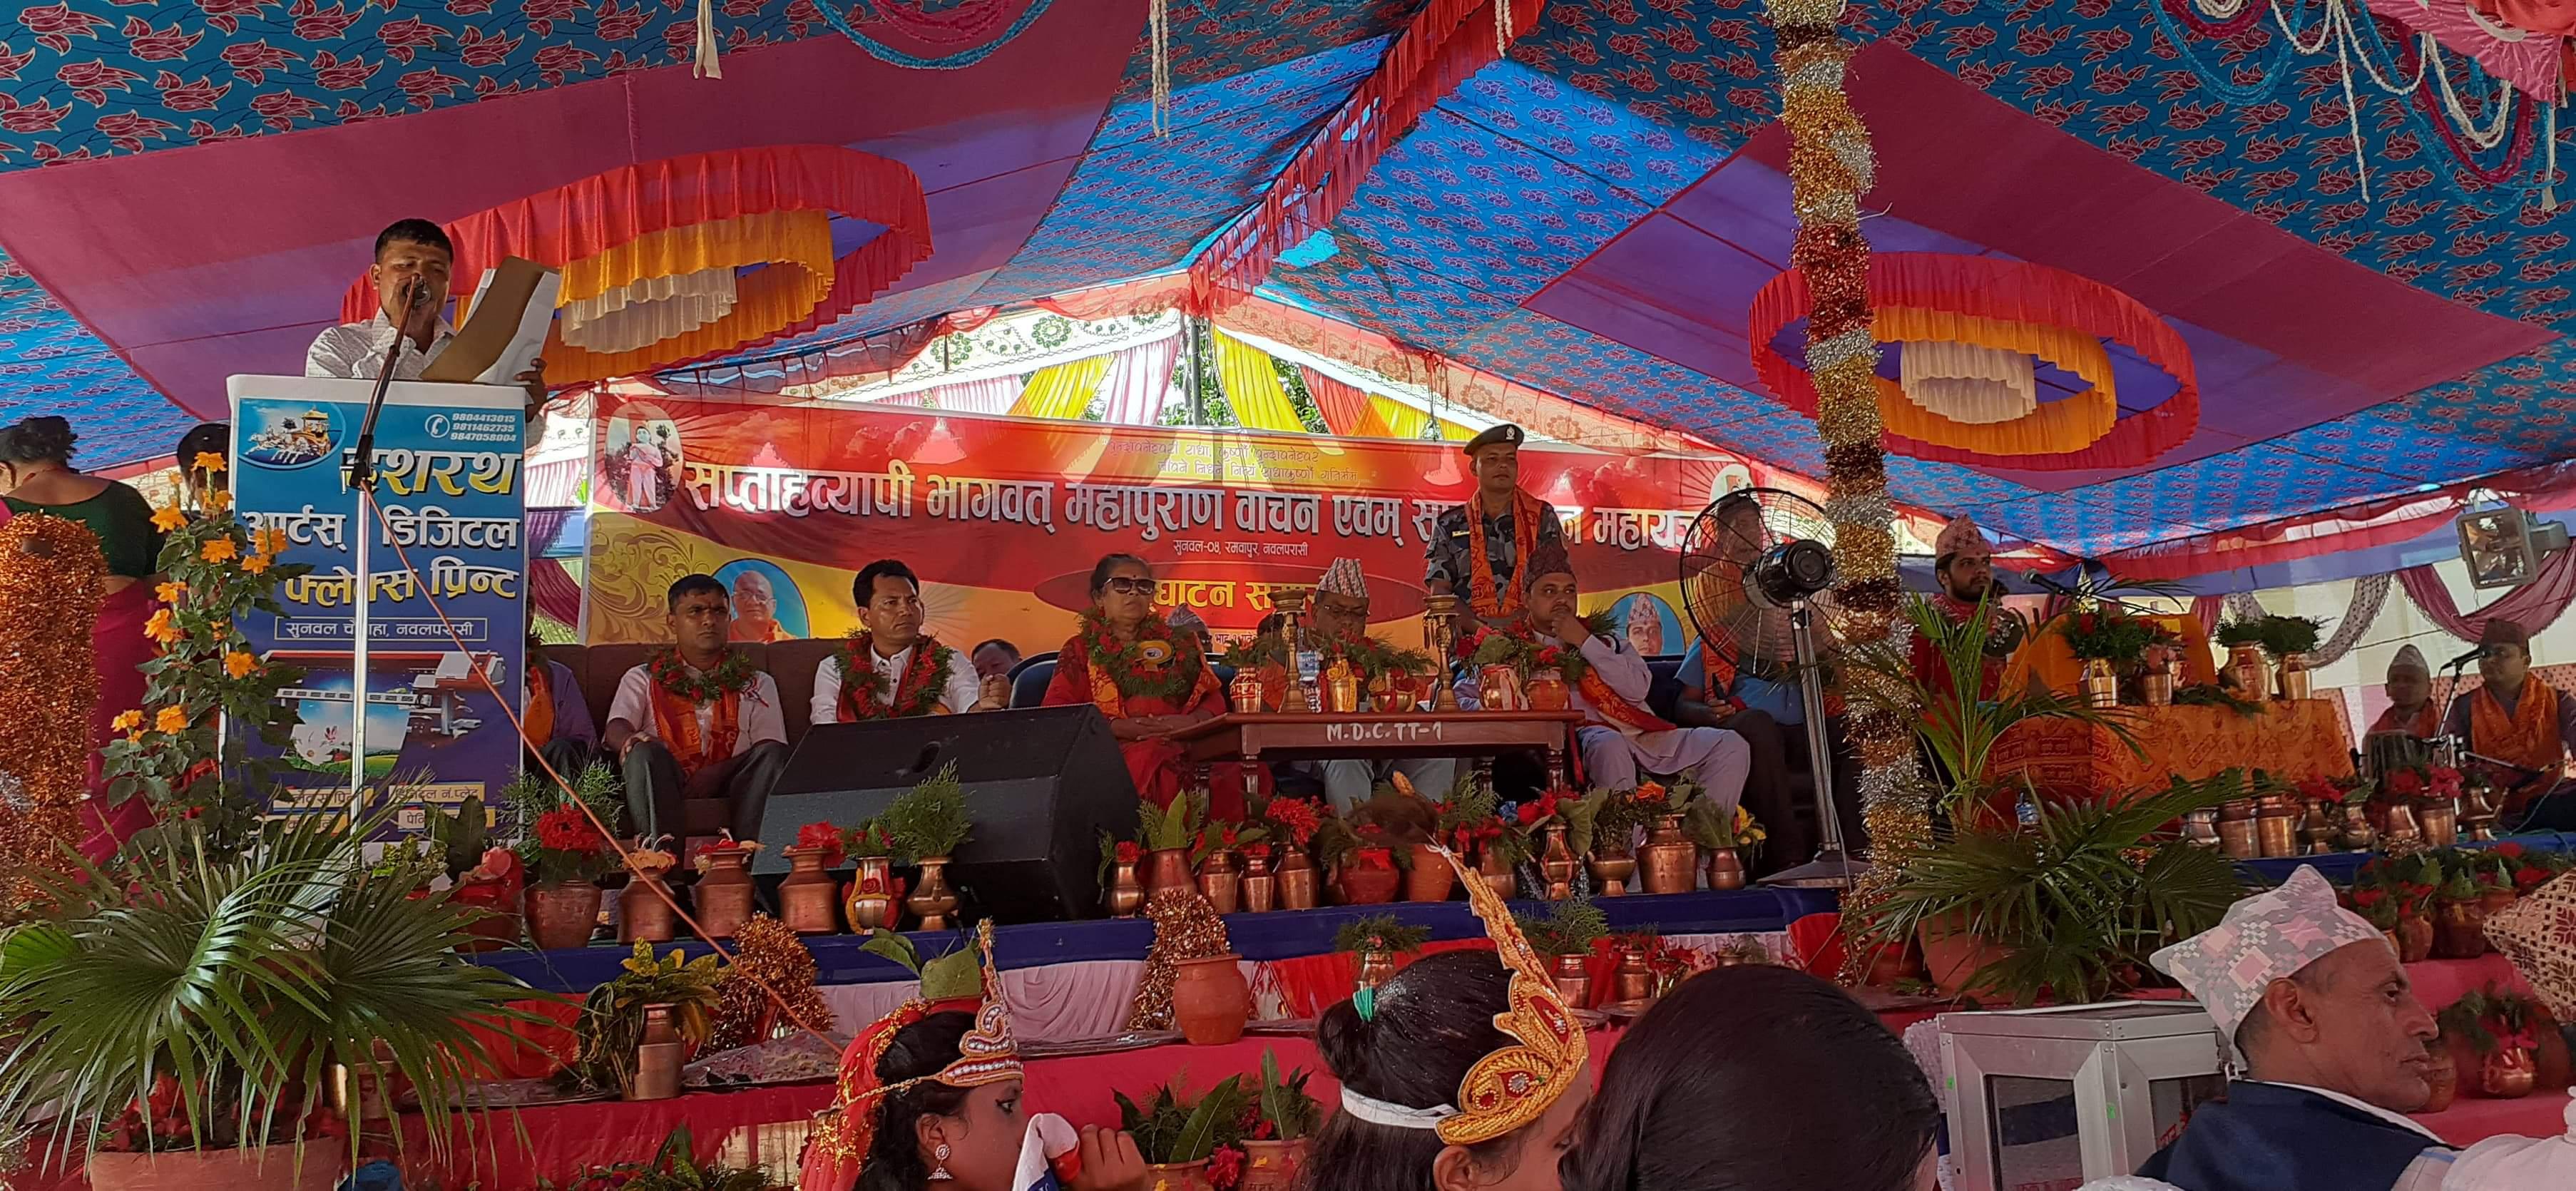 सप्ताहाव्यापि भागवत् महापुराण एवम् सप्ताहा ज्ञान महायज्ञ सुरु ( तस्वीर सहित )